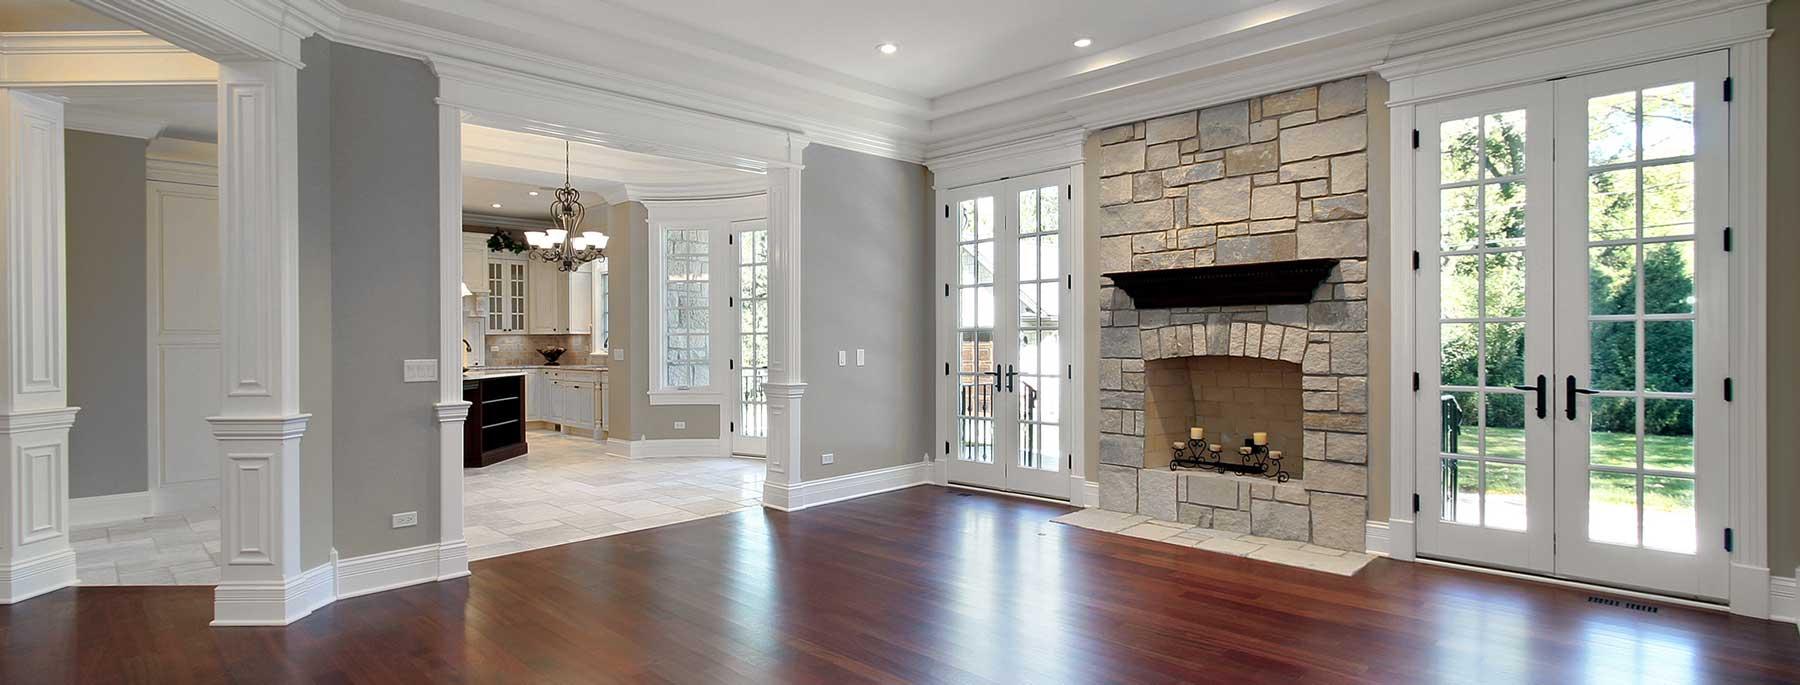 Semper Fi Home Inspections